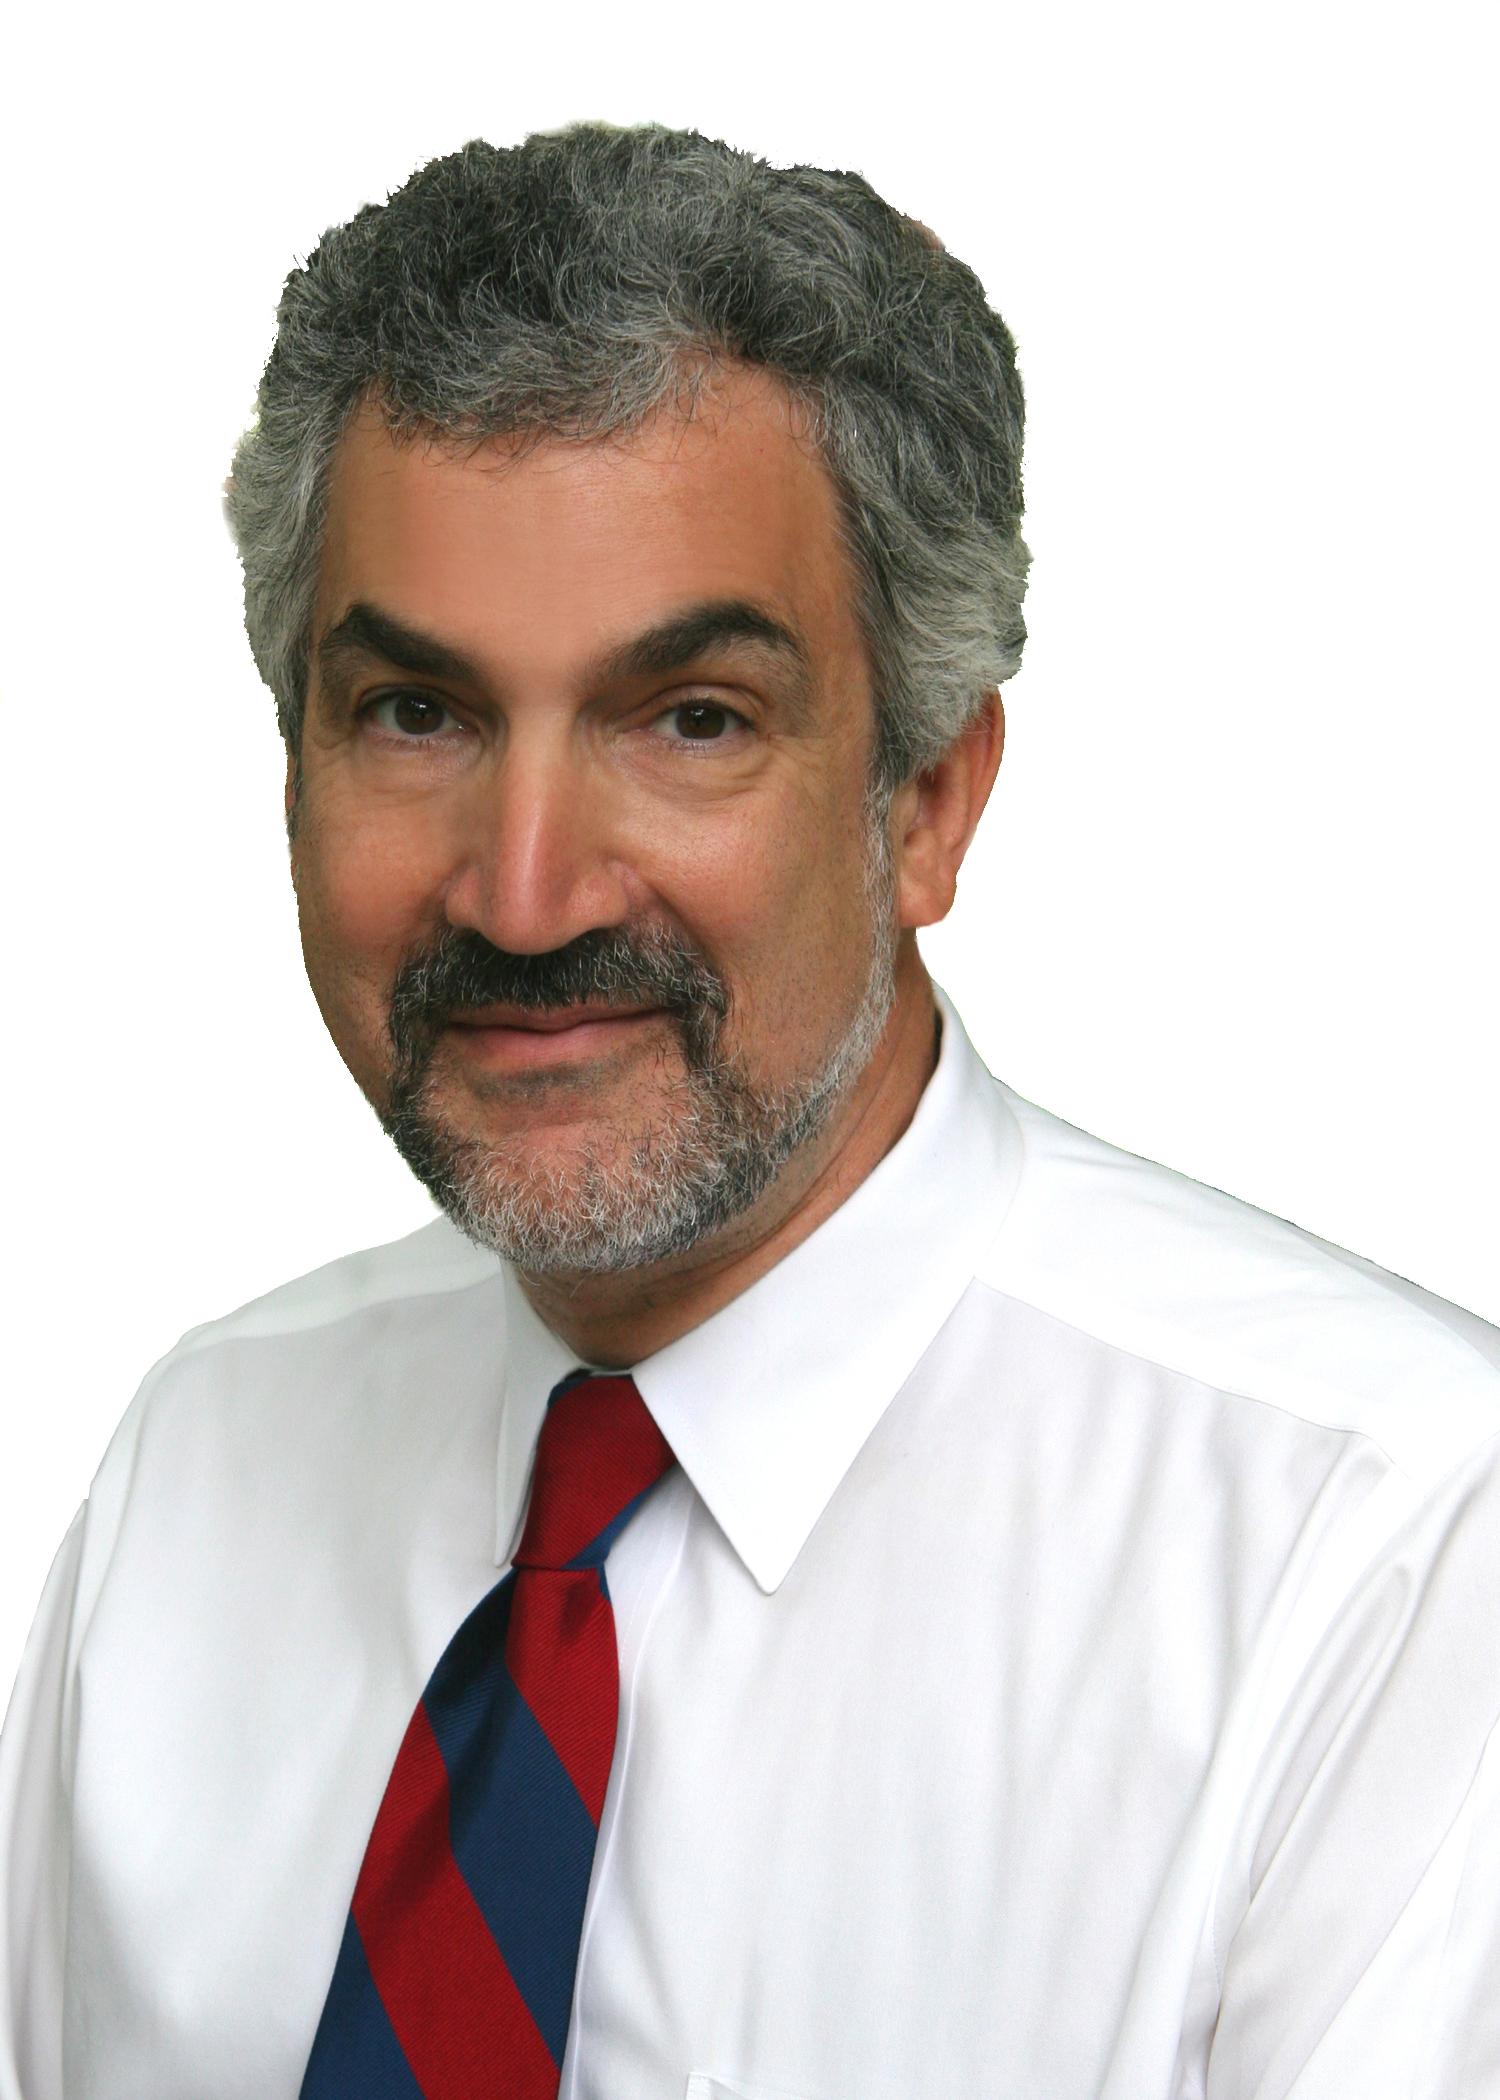 Daniel Pipes